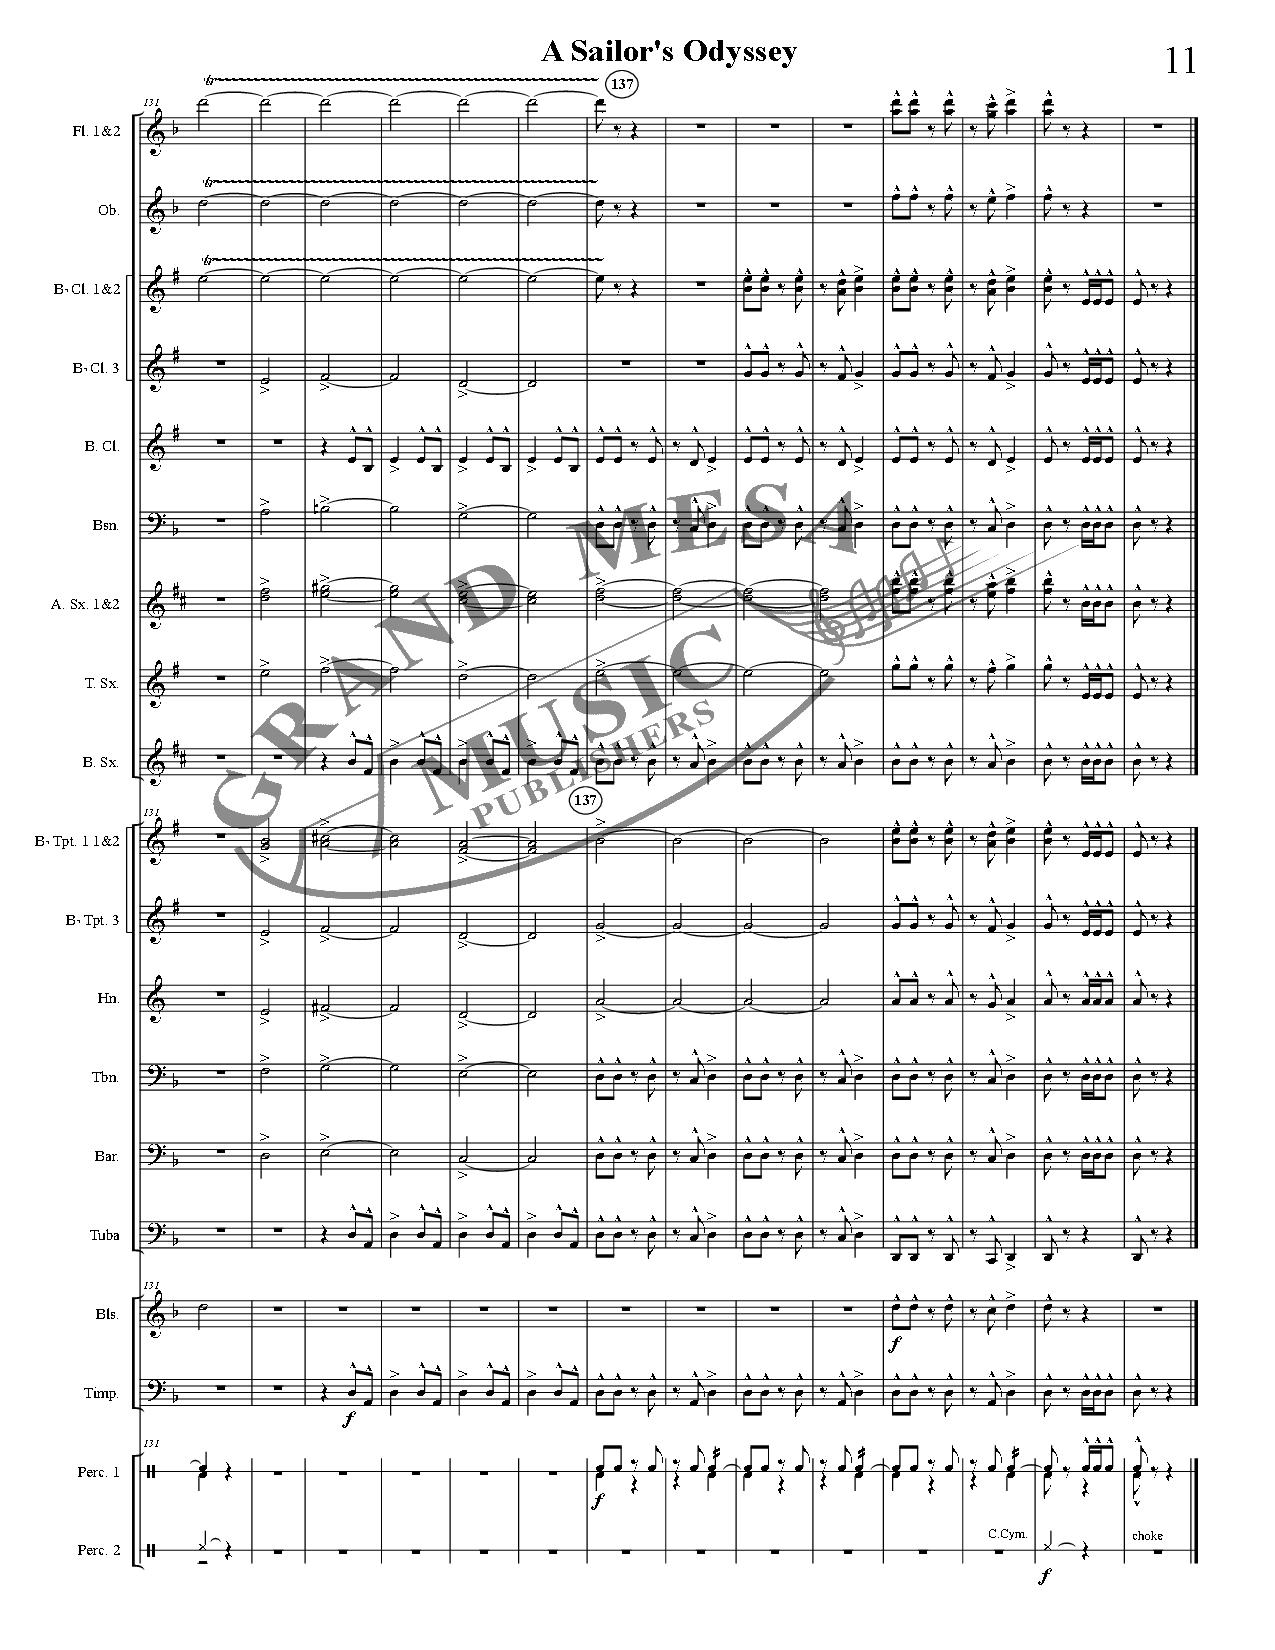 A Sailor's Odyssey arr. David Bobrowitz| J.W. Pepper Sheet